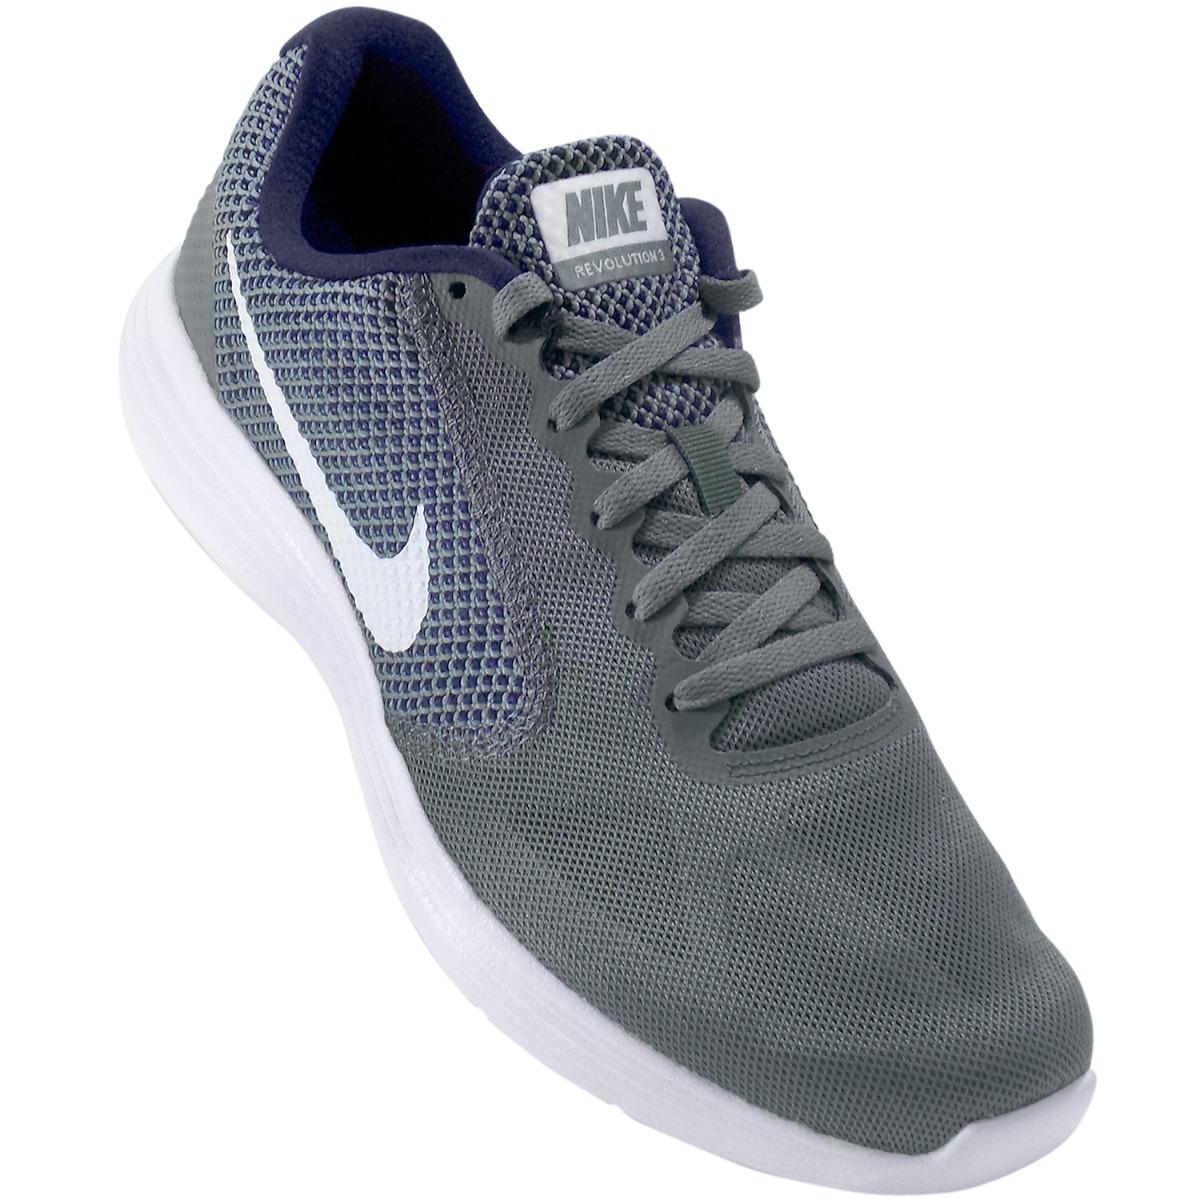 premium selection 662c7 621dd ... italy tenis nike gris revolution 3 running para hombre gris nike azul  marino 7e26d5 d3f9e 7dc0e